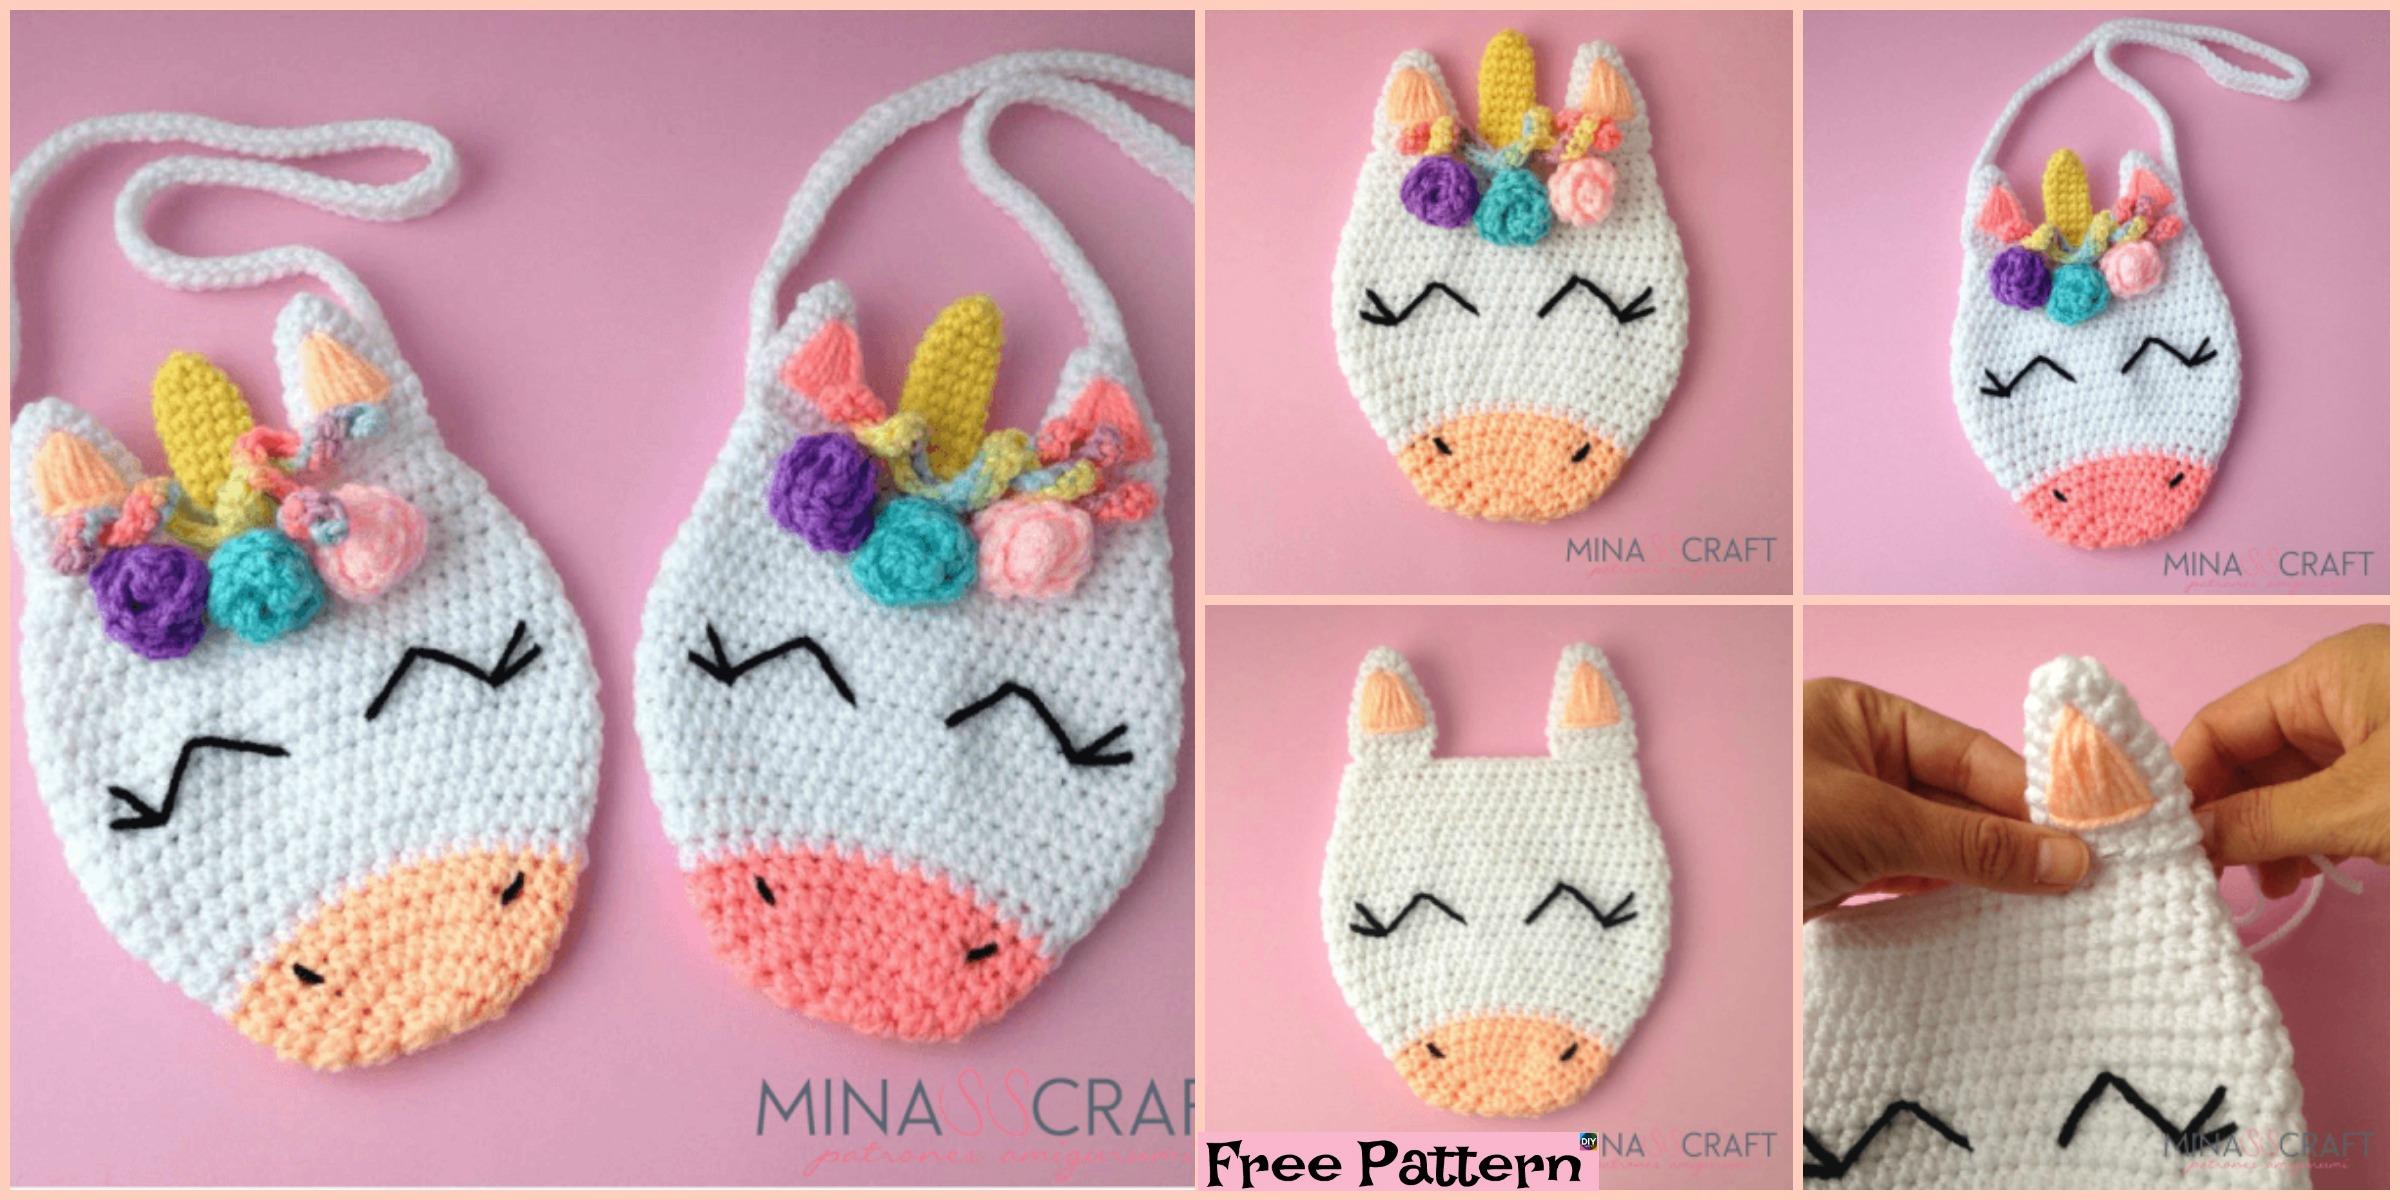 Adorable Crochet Unicorn Purse - Free Pattern - DIY 4 EVER